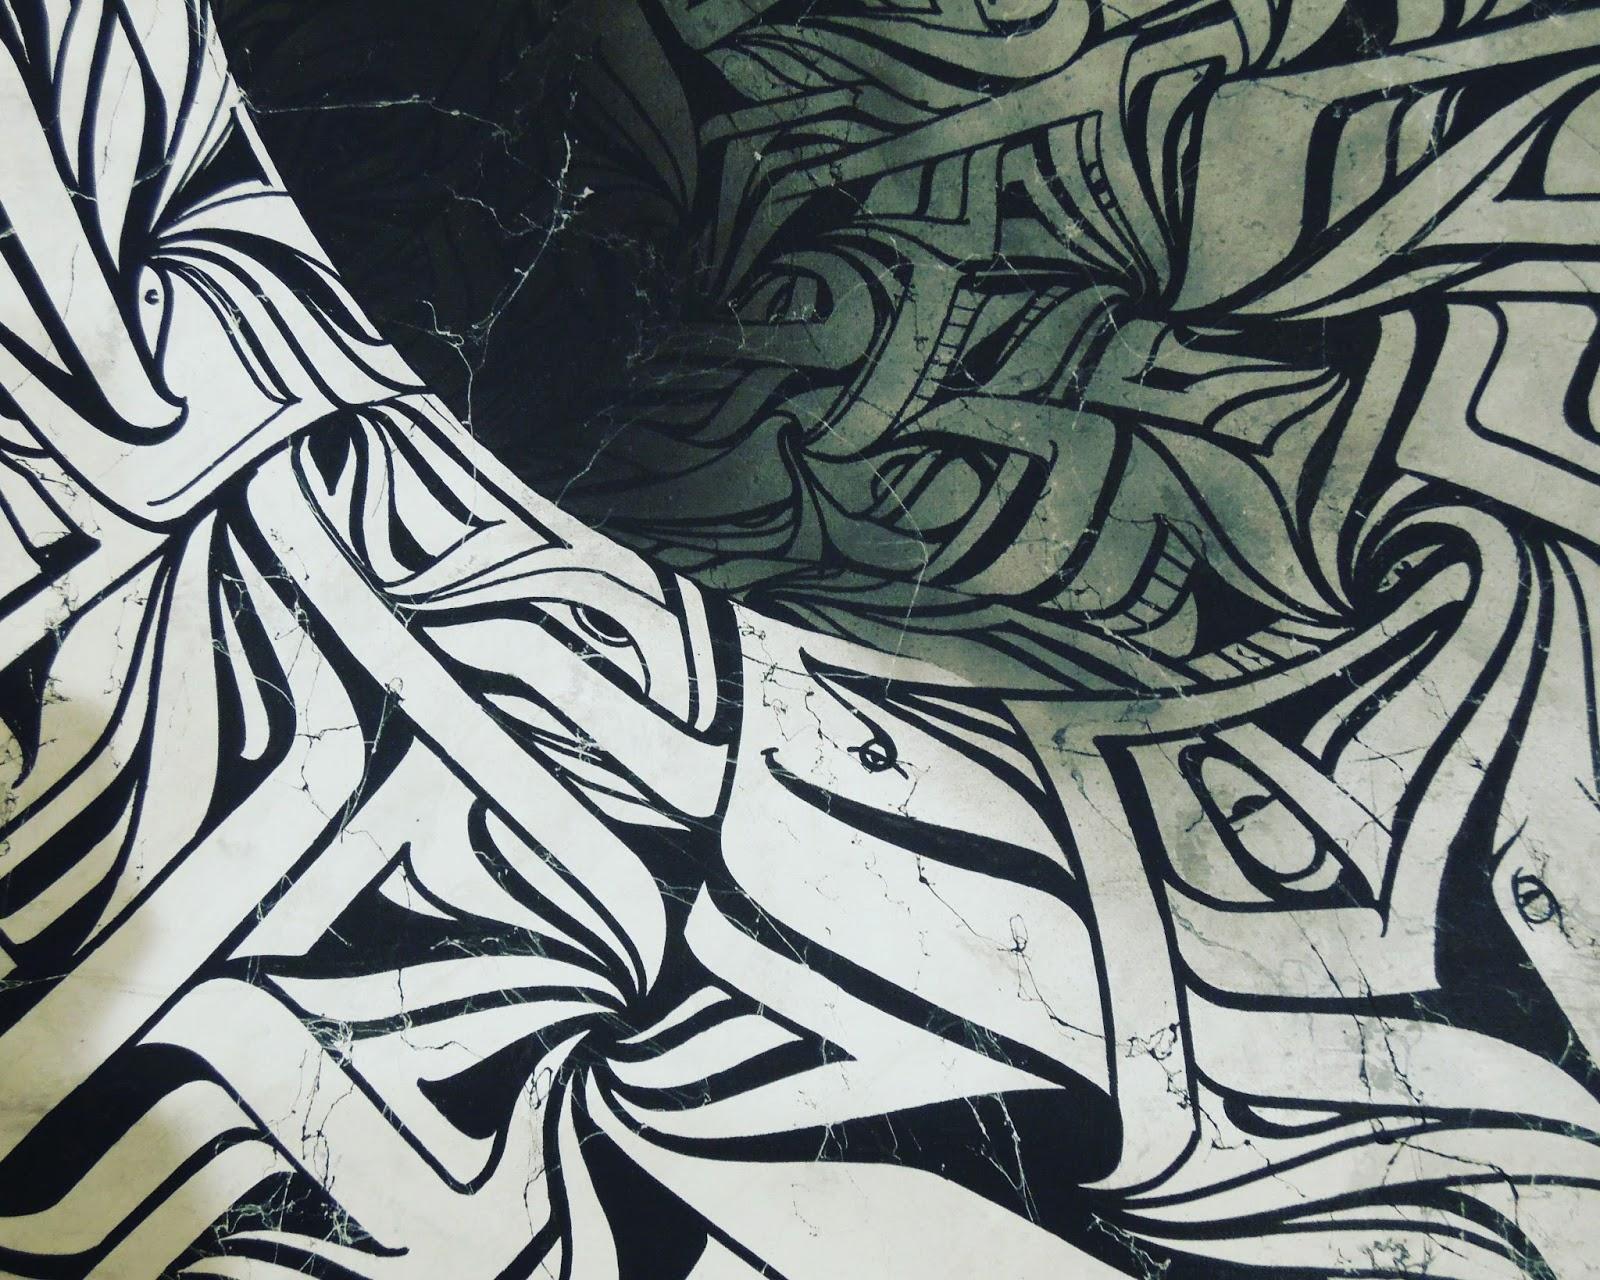 art by astro street artiste